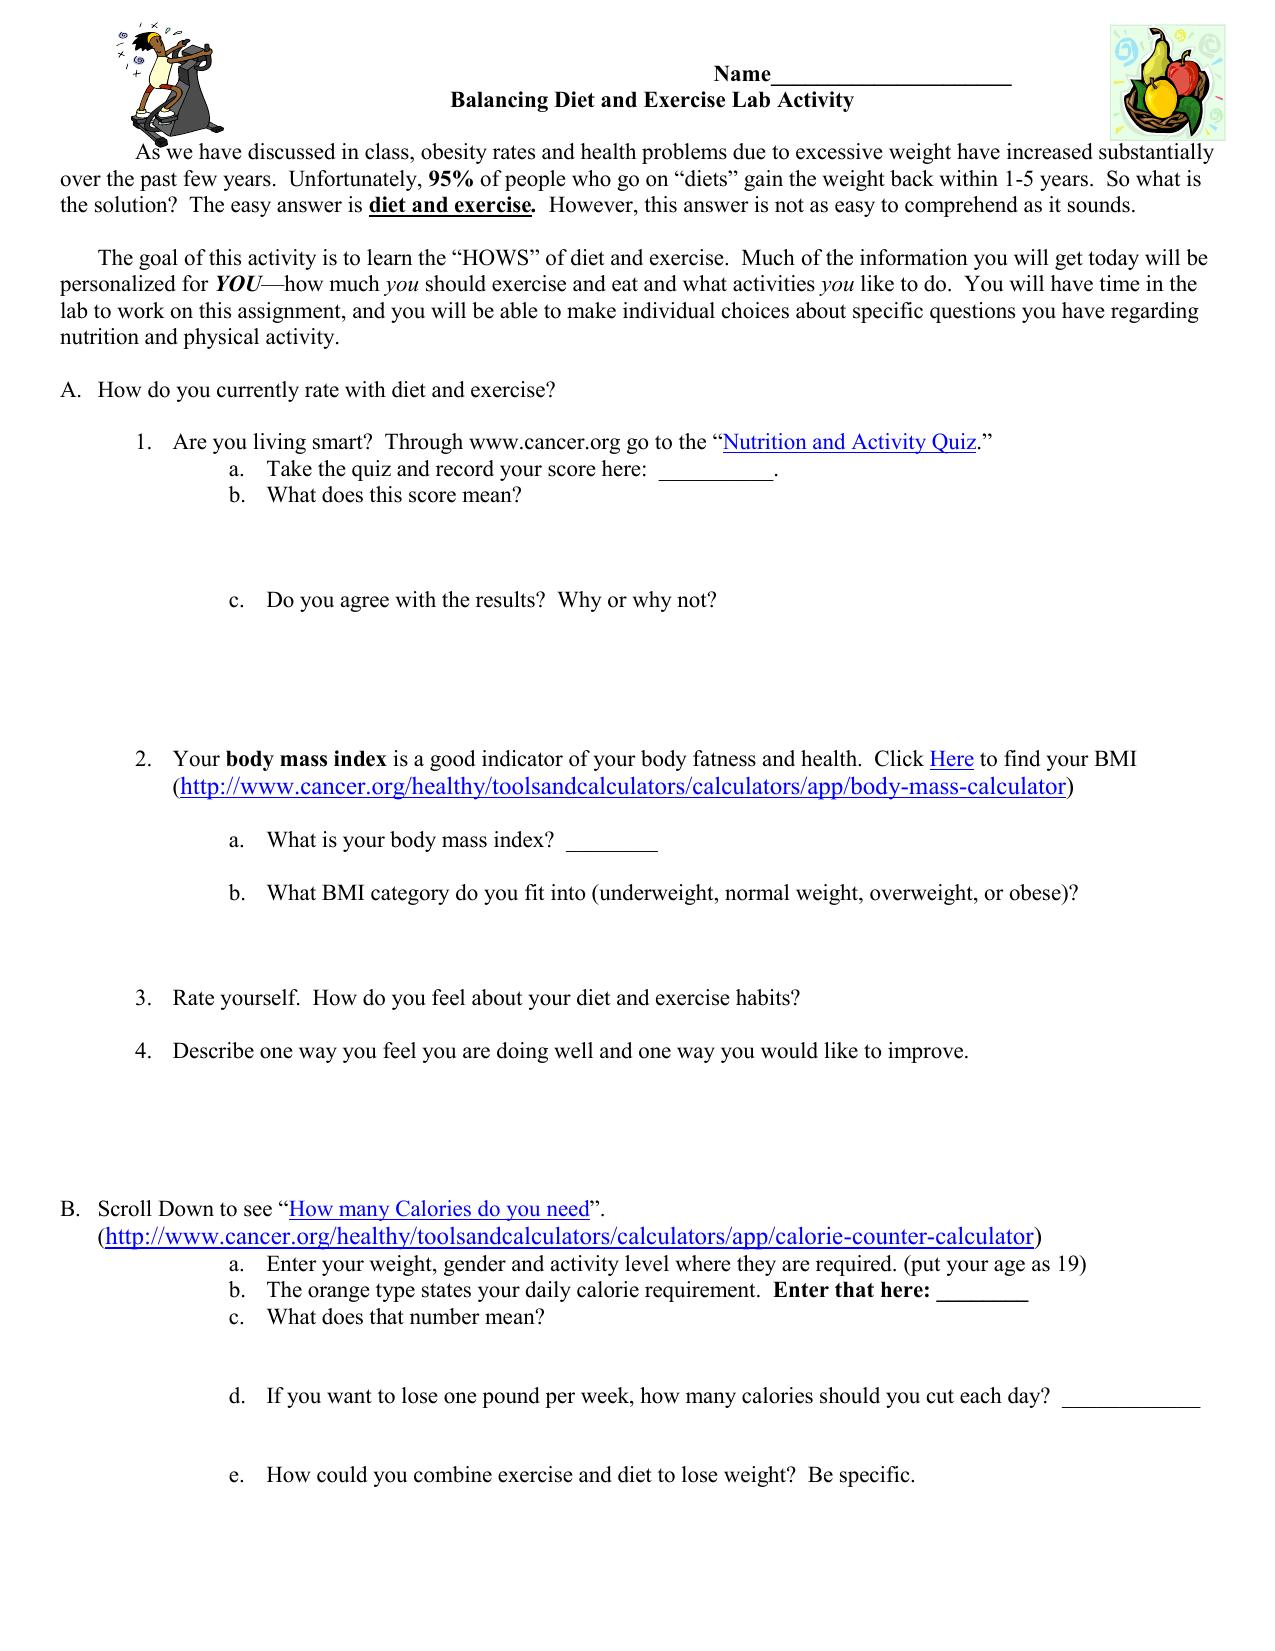 Bill Nye Nutrition Quiz